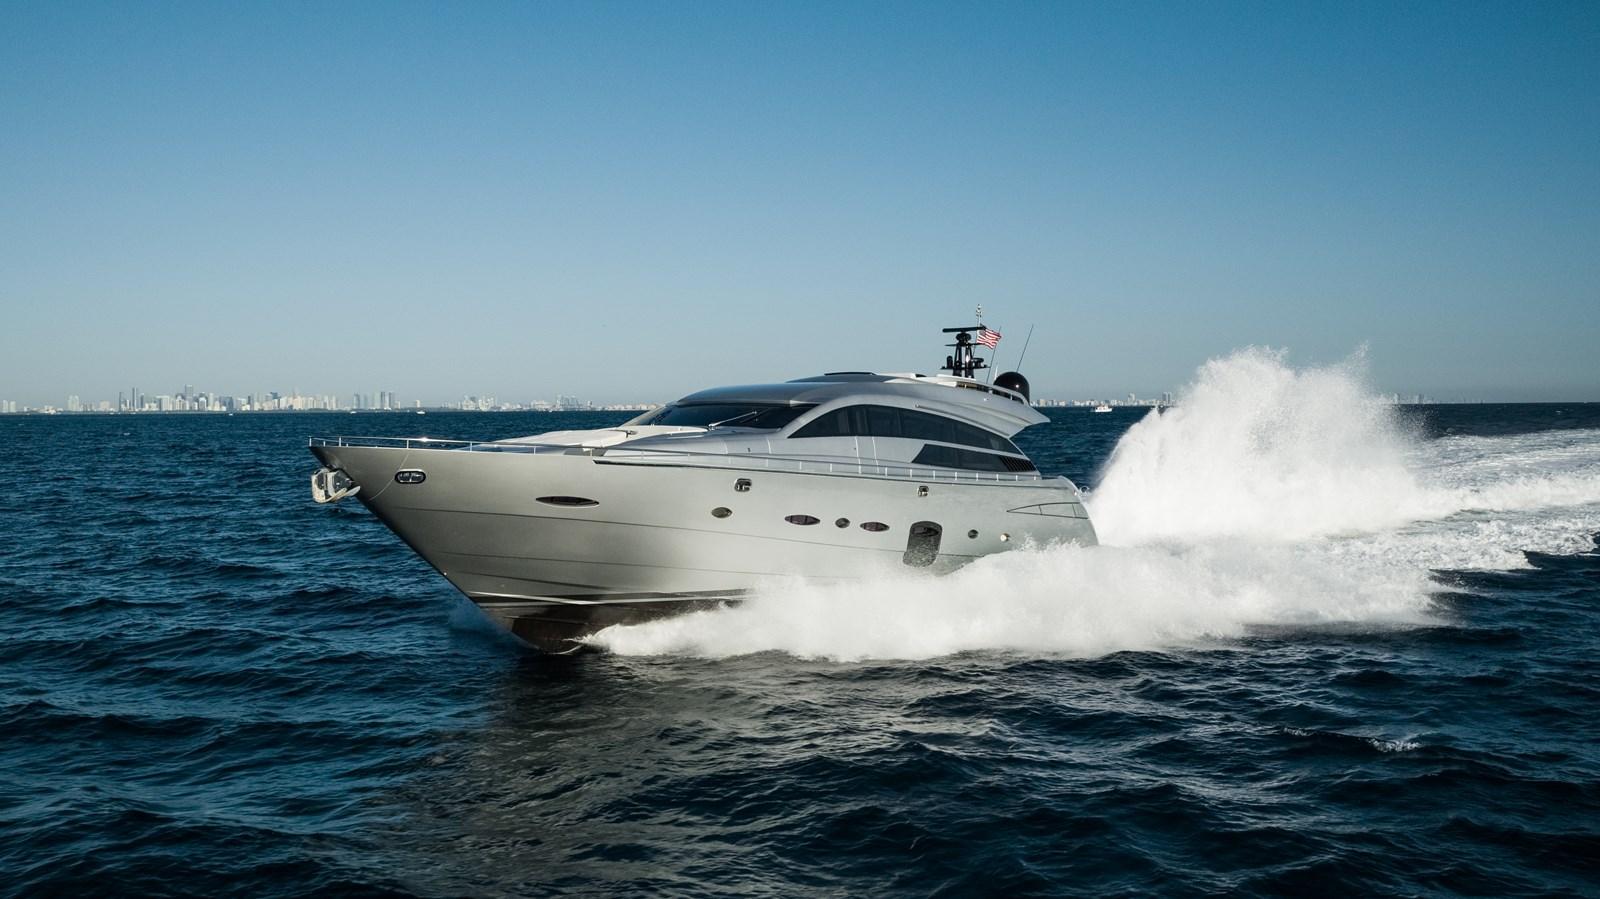 DJI_0009 2012 PERSHING  Motor Yacht 2810219